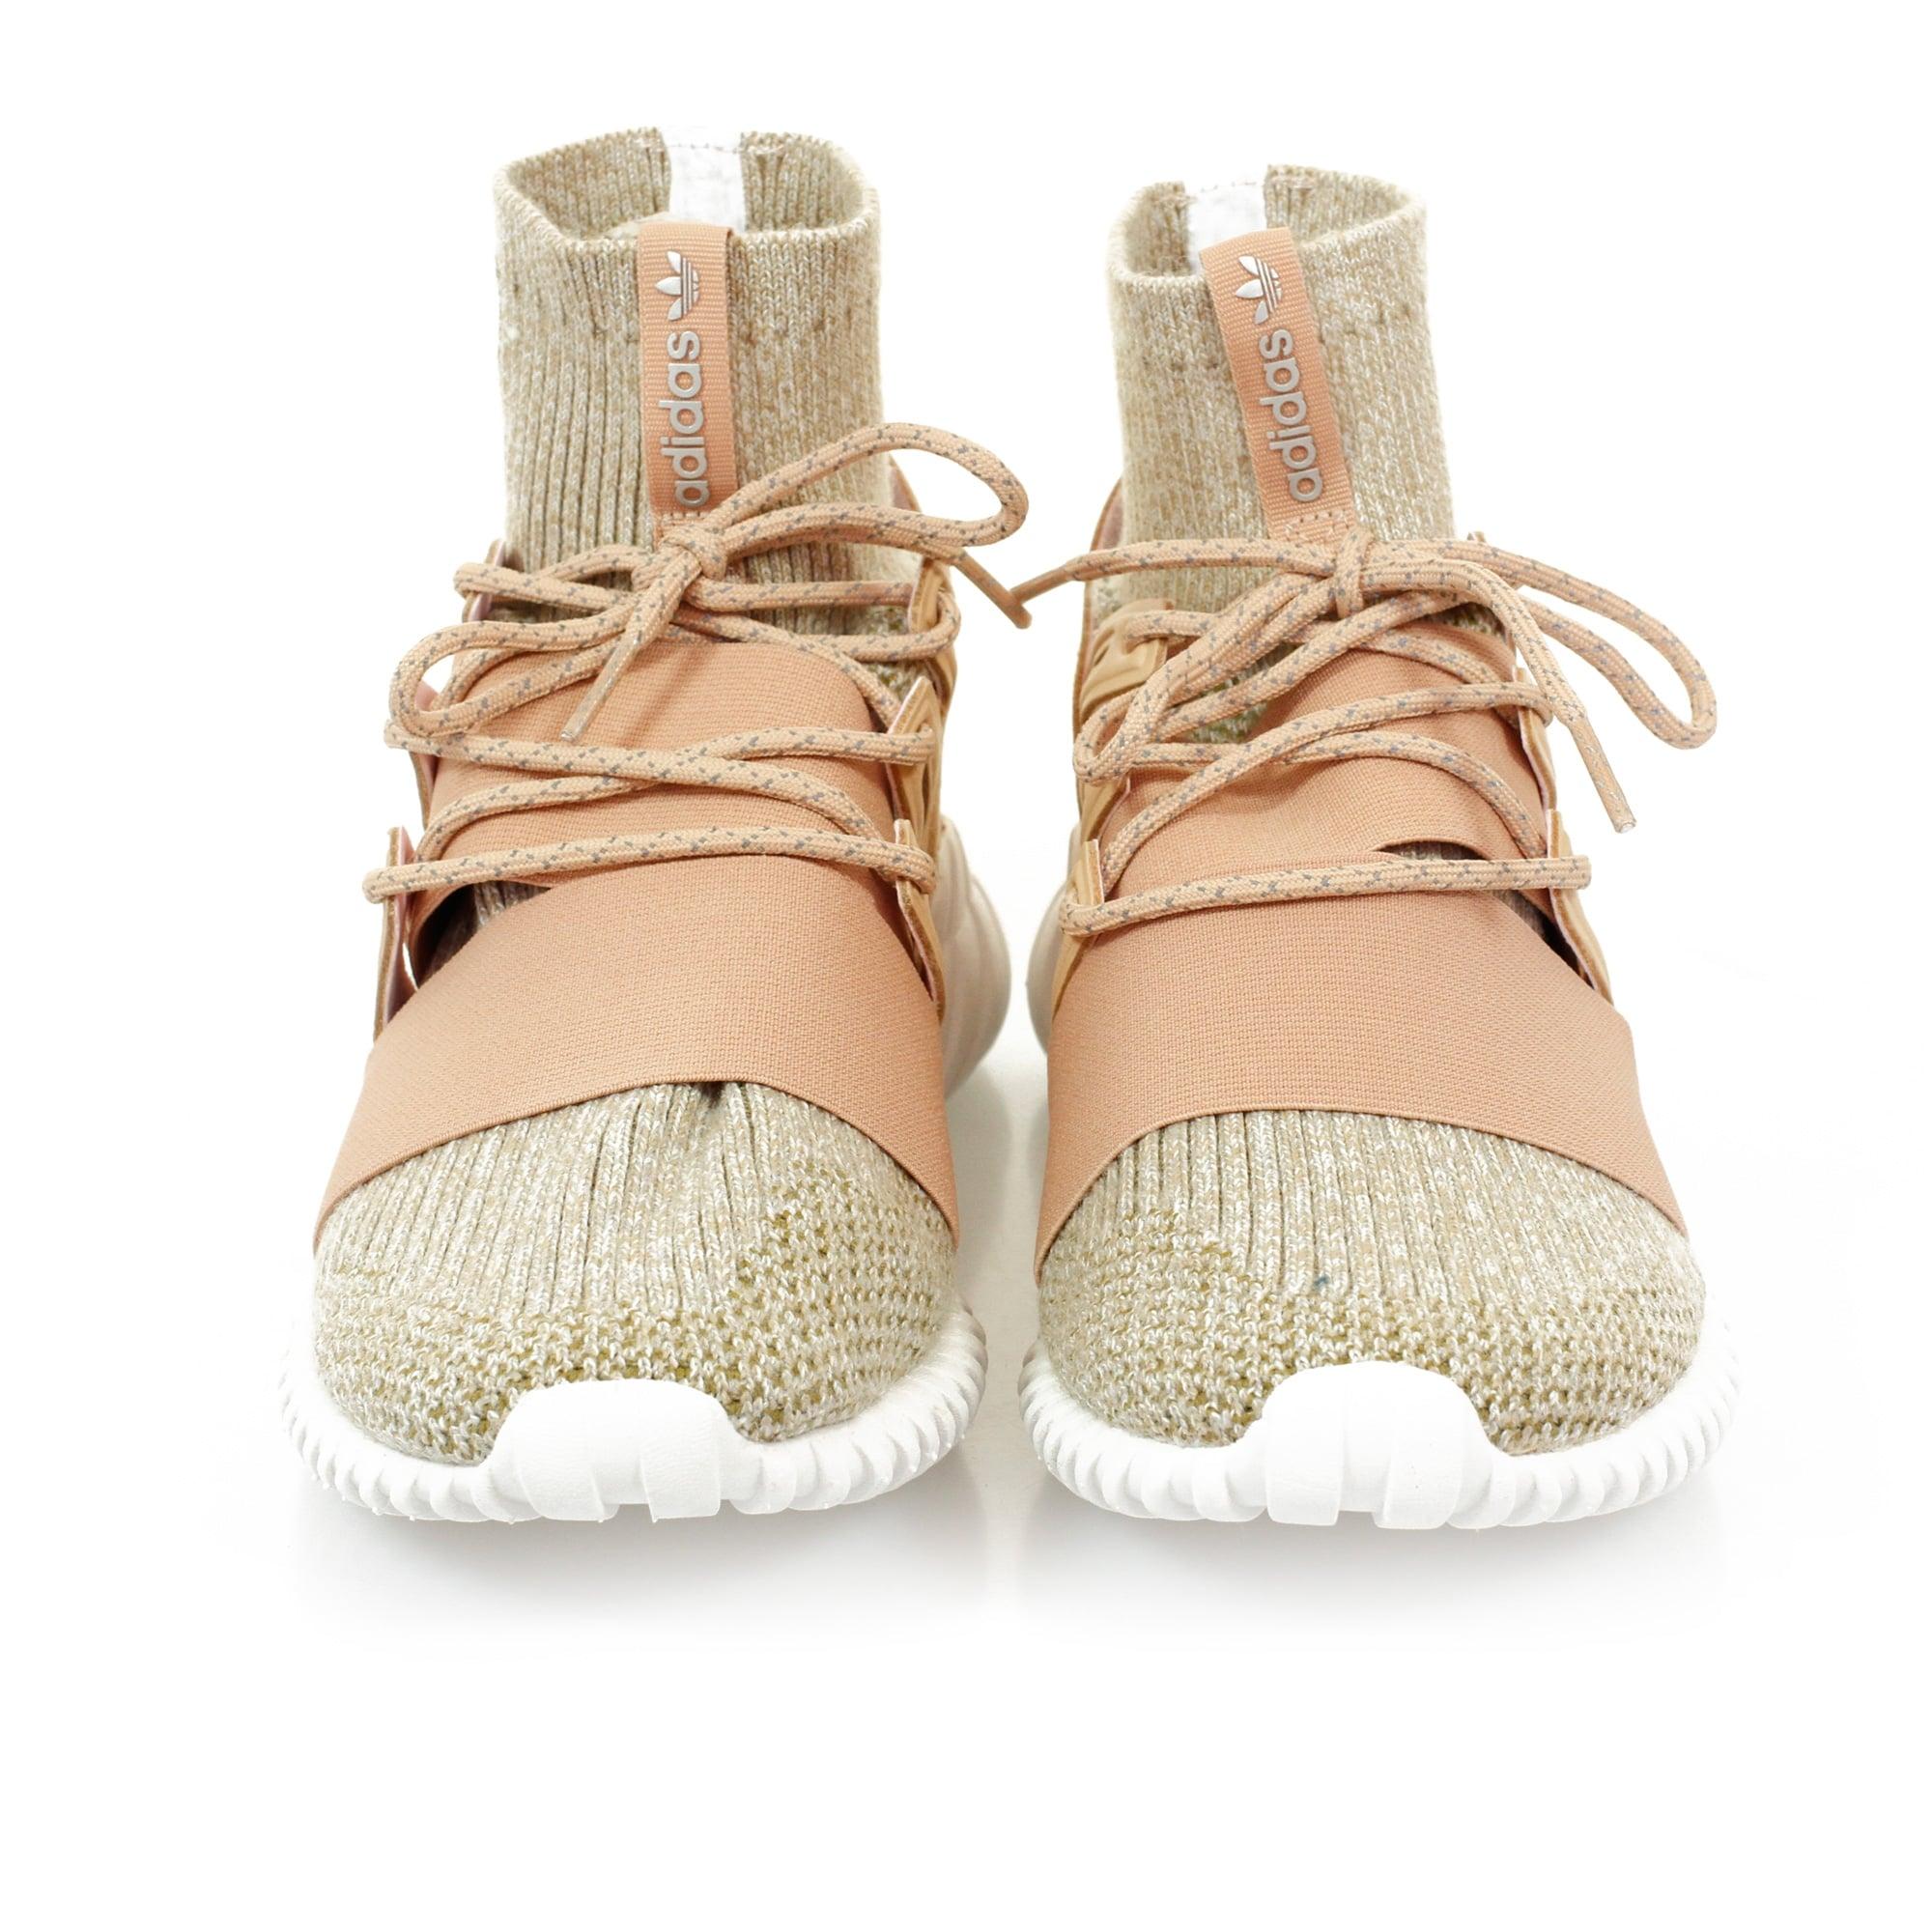 reputable site 9d539 fa8b5 sebago shoes adidas tubular winter